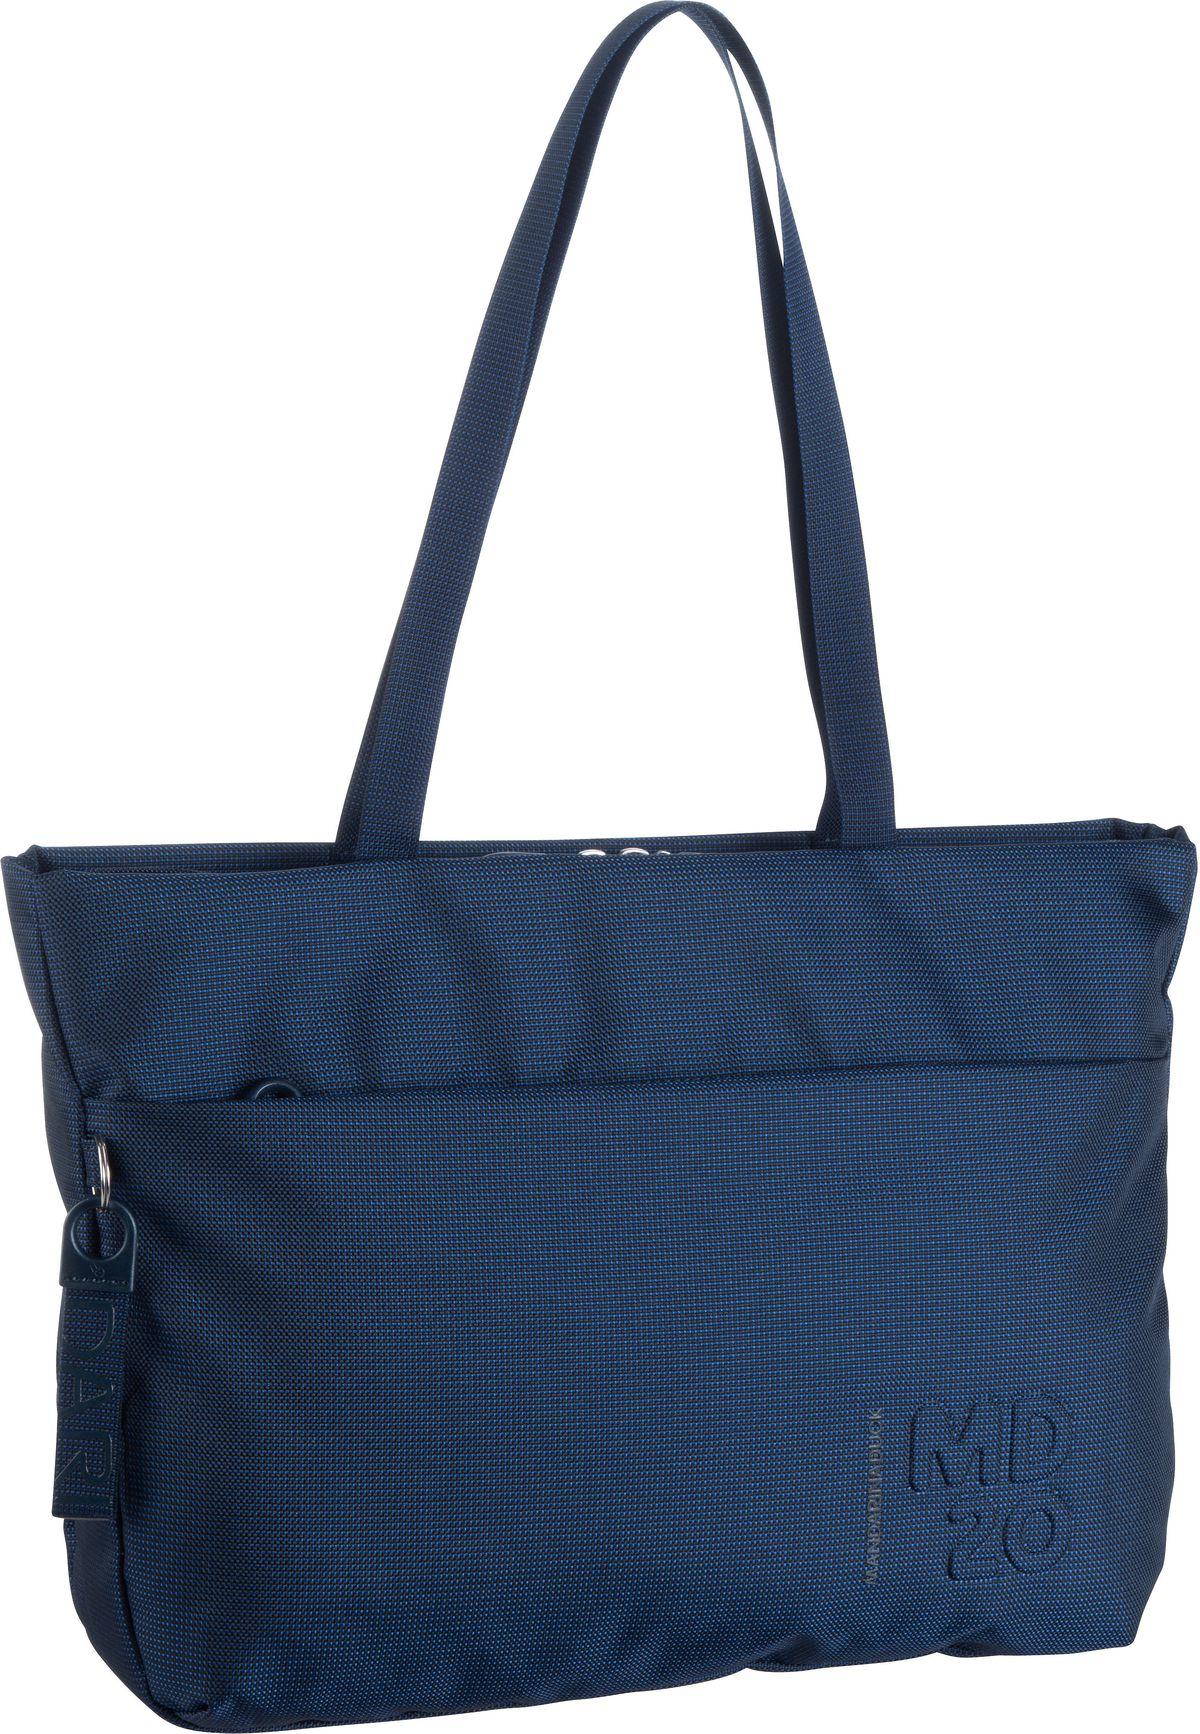 Handtasche MD20 Shoulder Bag QMT14 Dress Blue